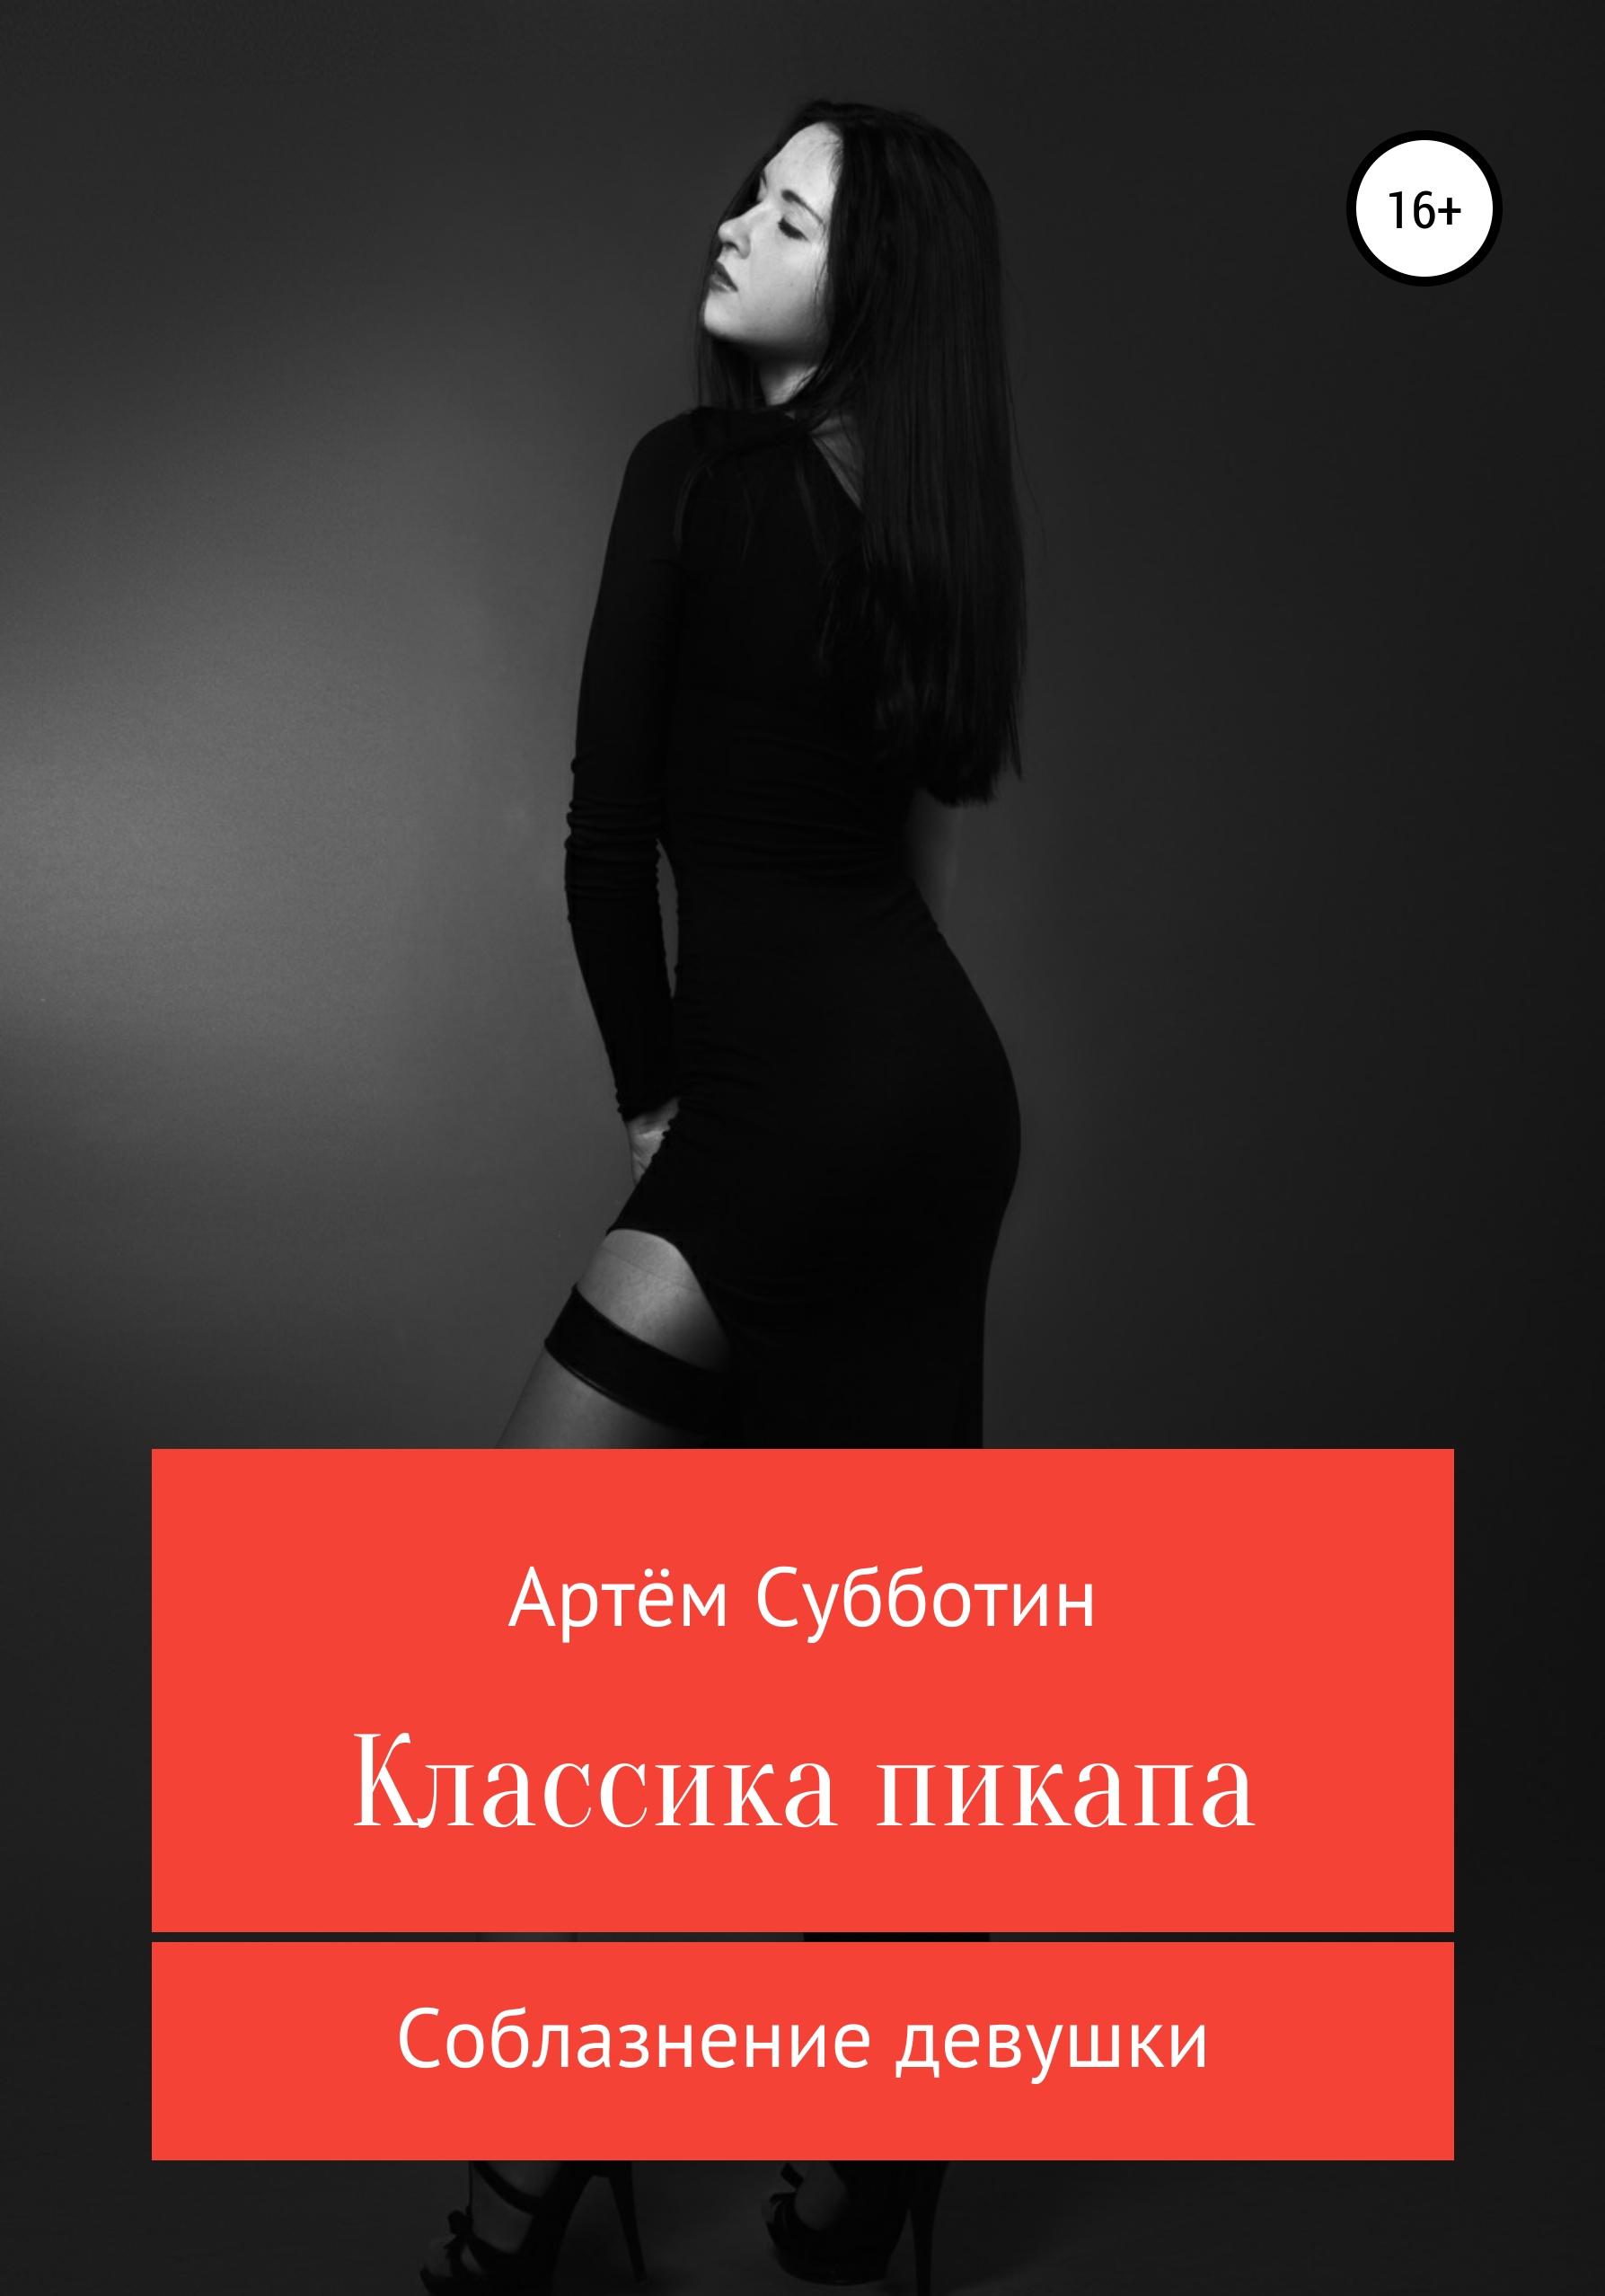 Купить книгу Классика пикапа. Соблазнение девушки, автора Артёма Яновича Субботина